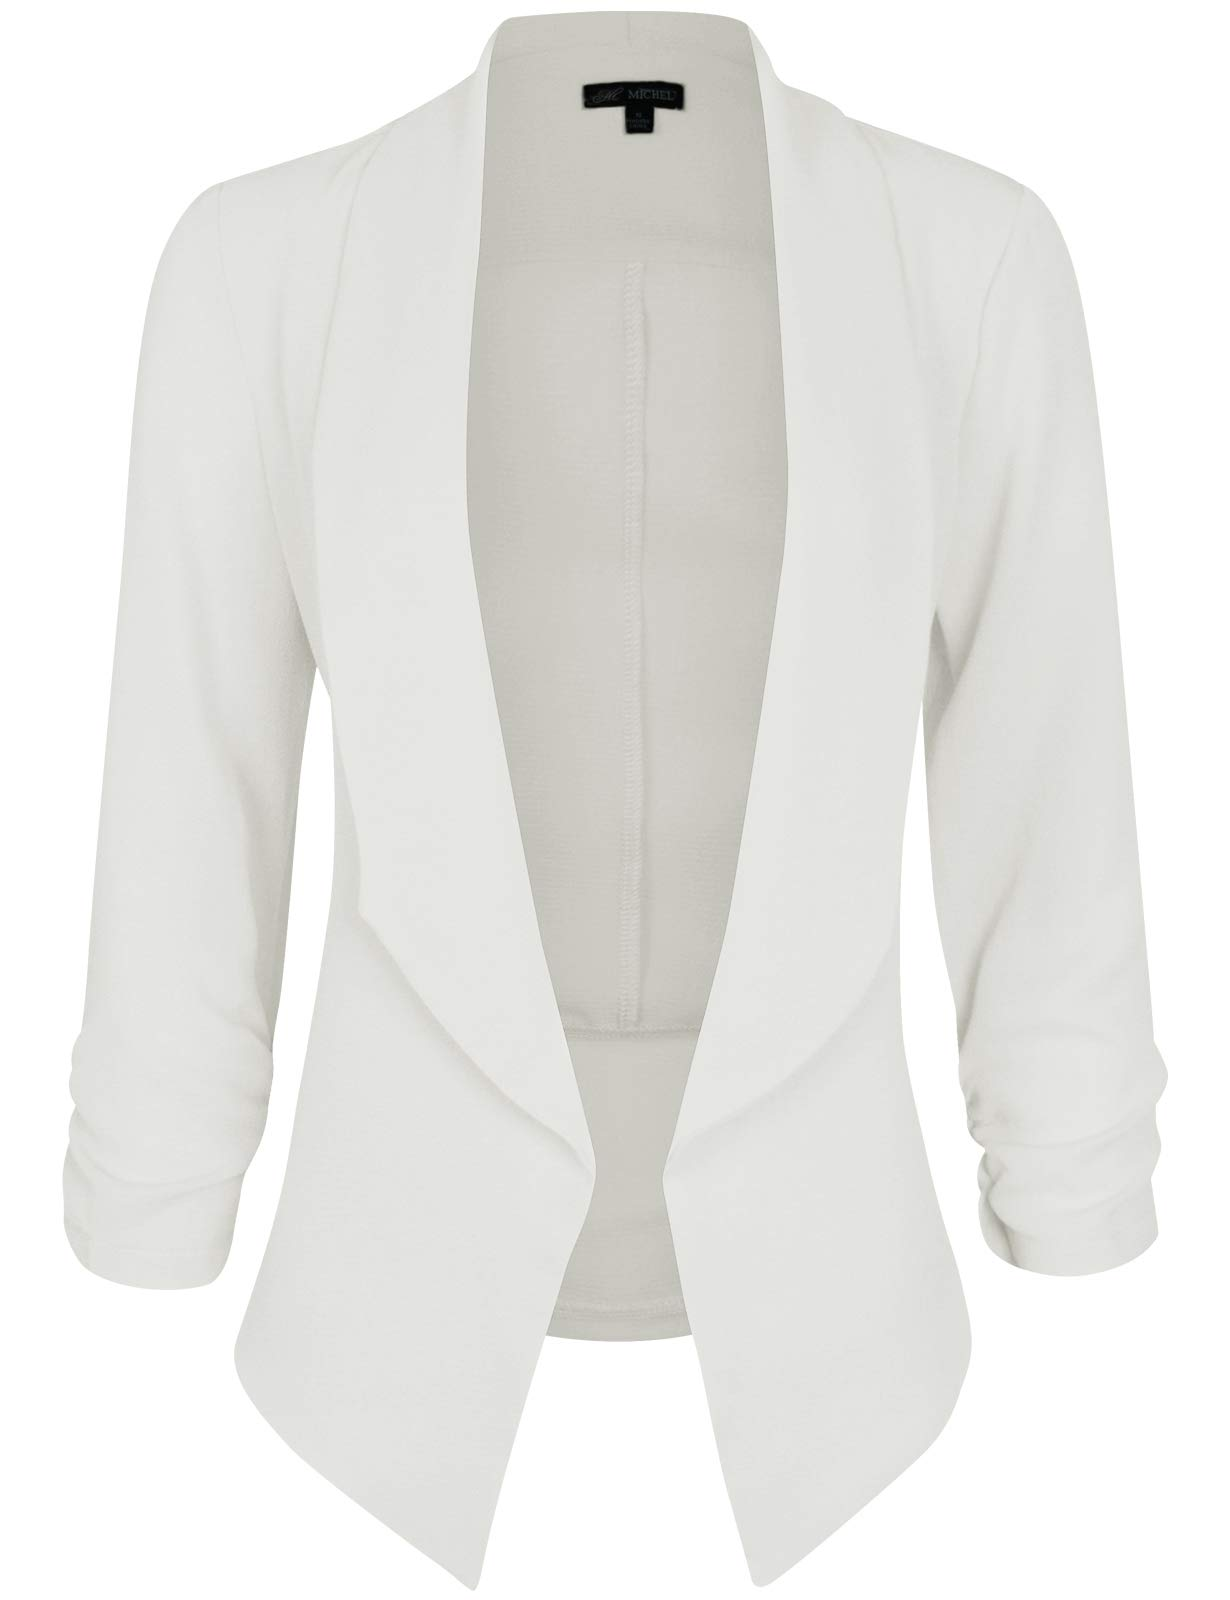 Michel Women's 3/4 Sleeve Blazer Casual Open Front Cardian Jacket Work Office Blazer White Small